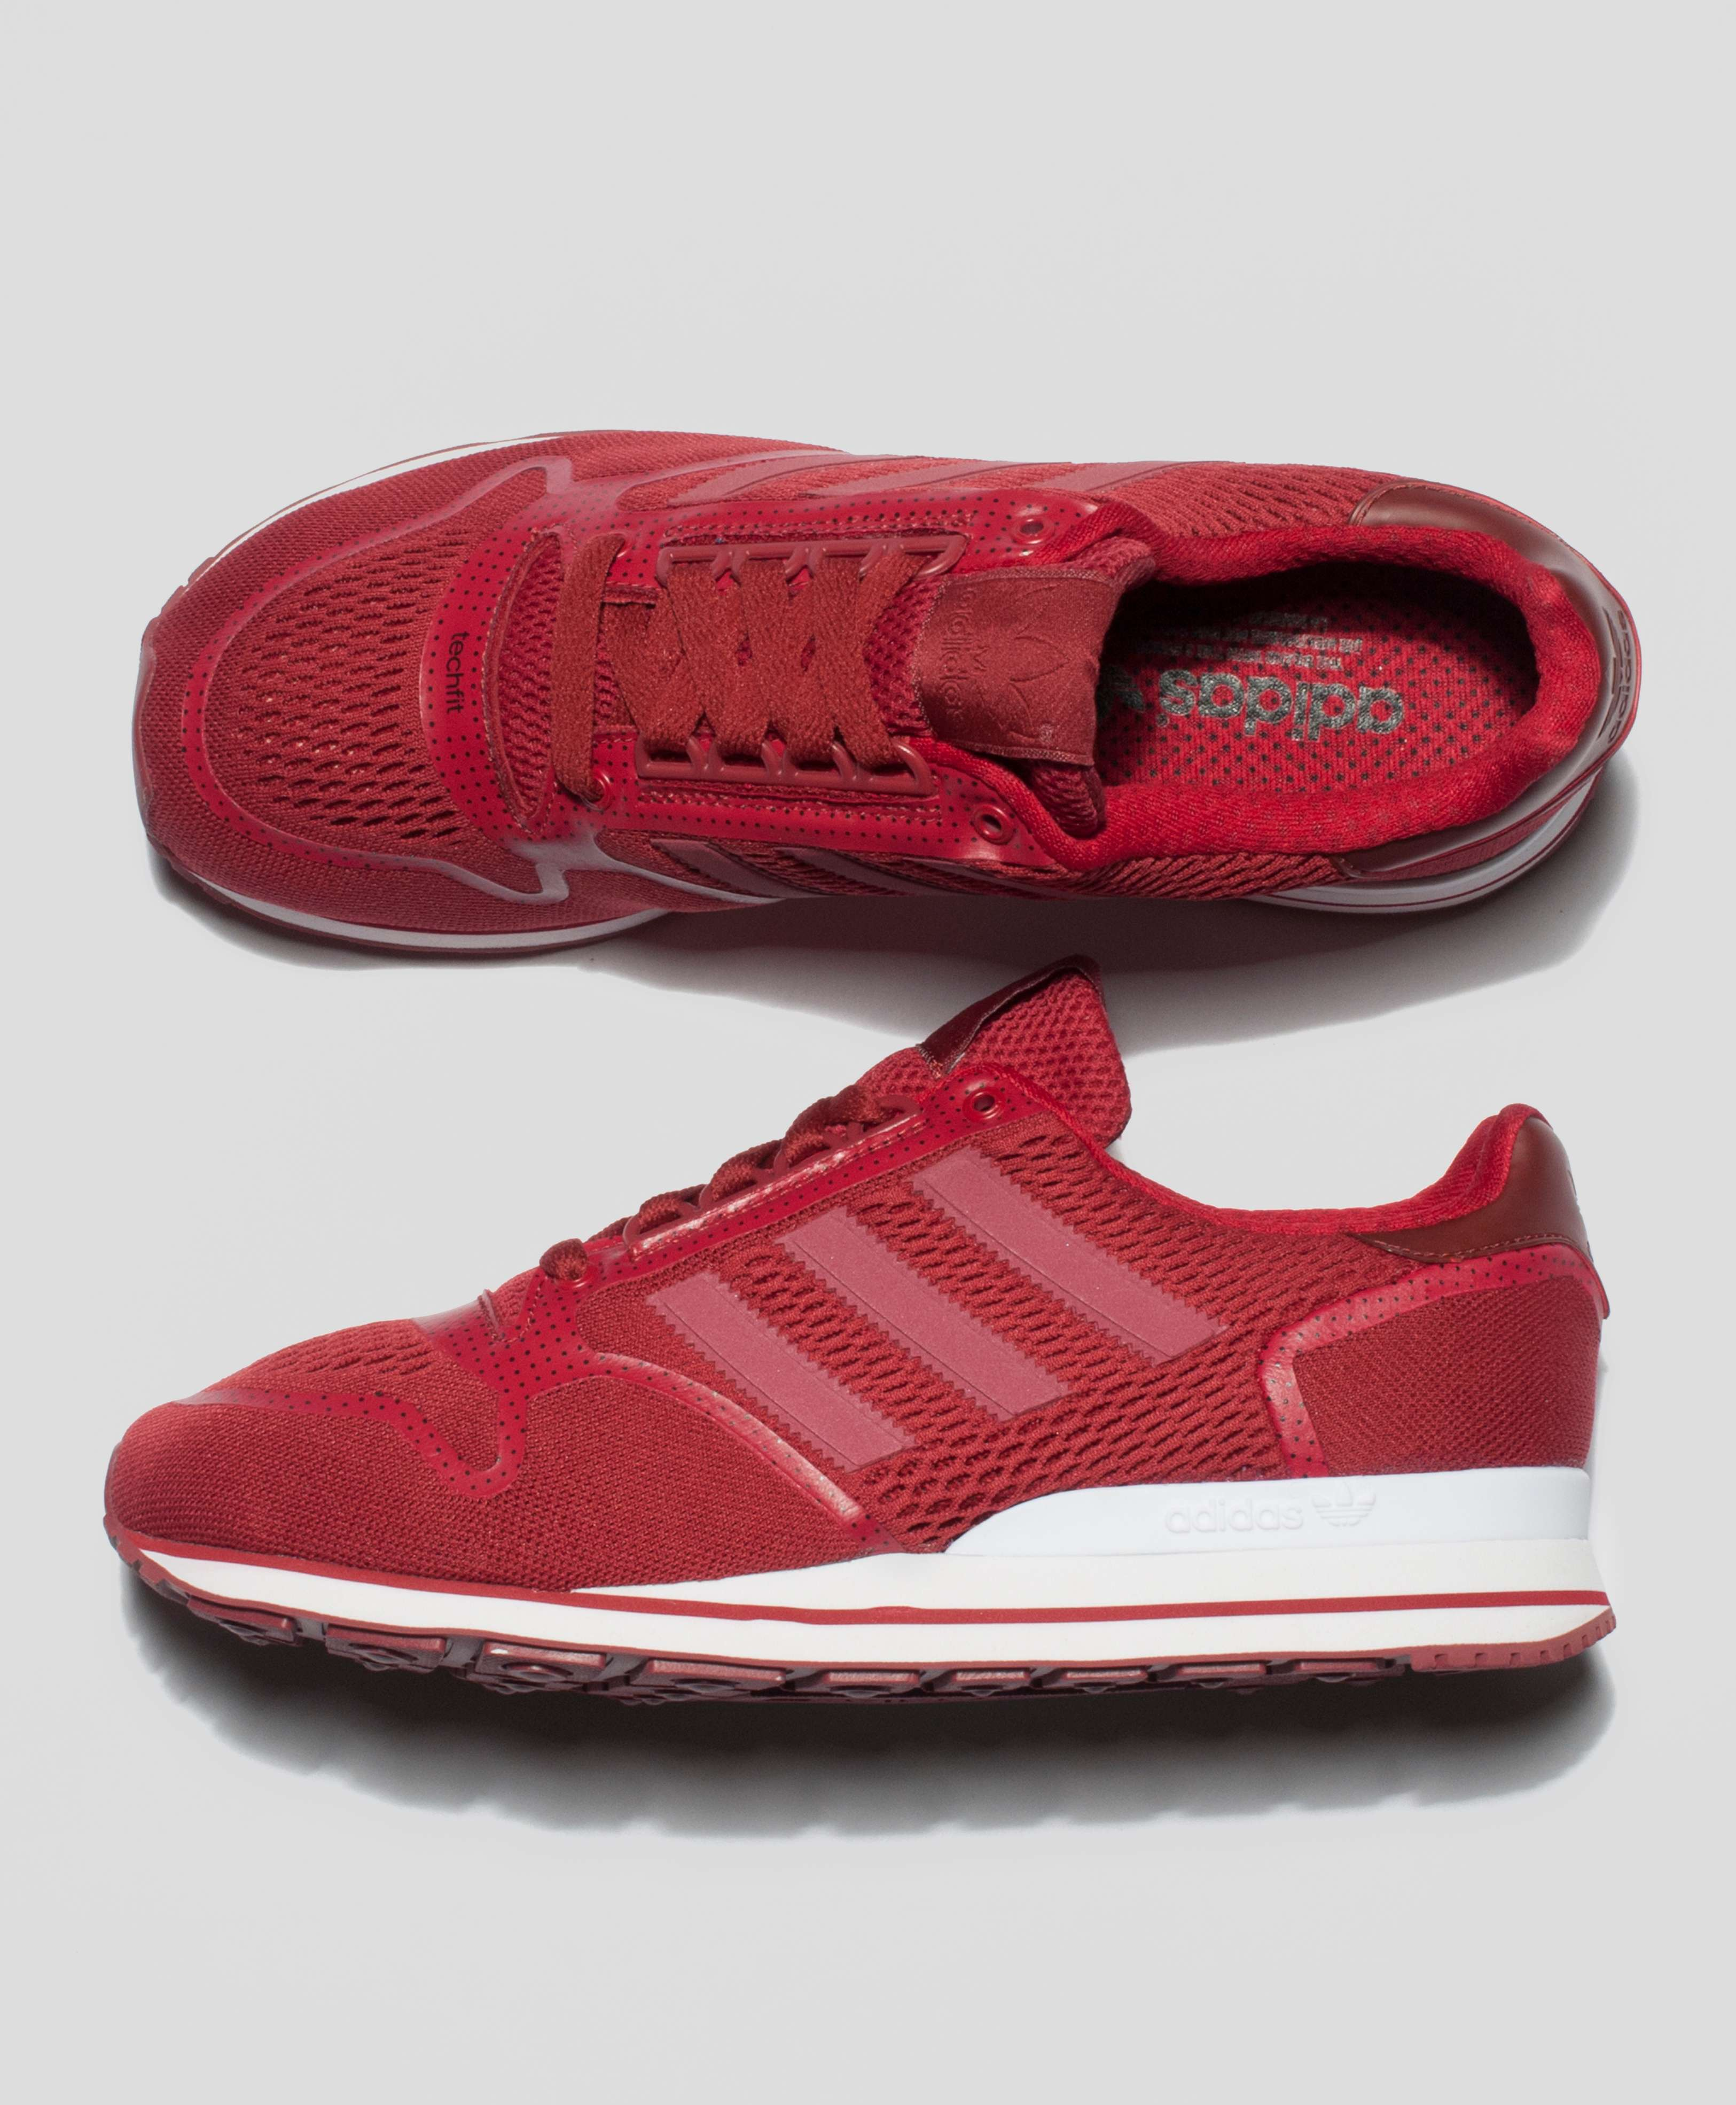 adidas zx 500 techfit